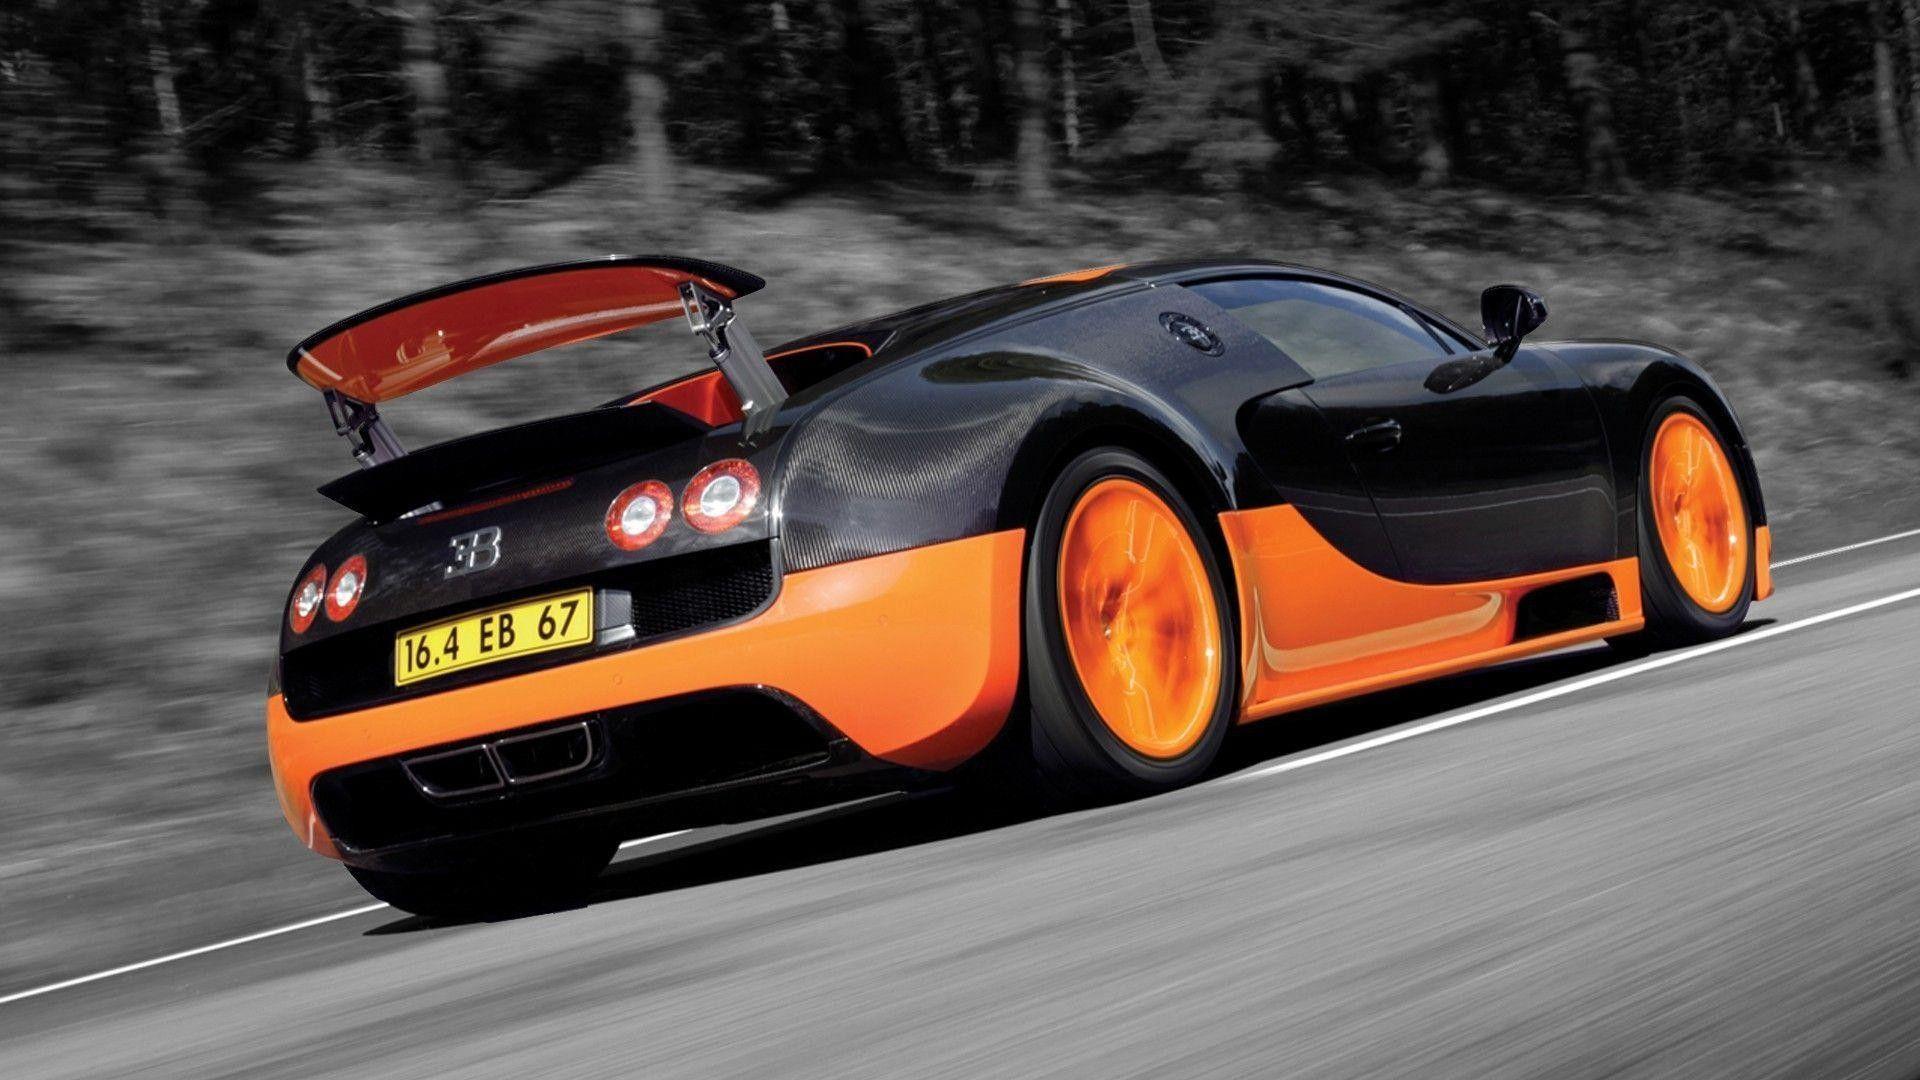 Bugatti Veyron Super Sport Wallpapers Top Free Bugatti Veyron Super Sport Backgrounds Wallpaperaccess